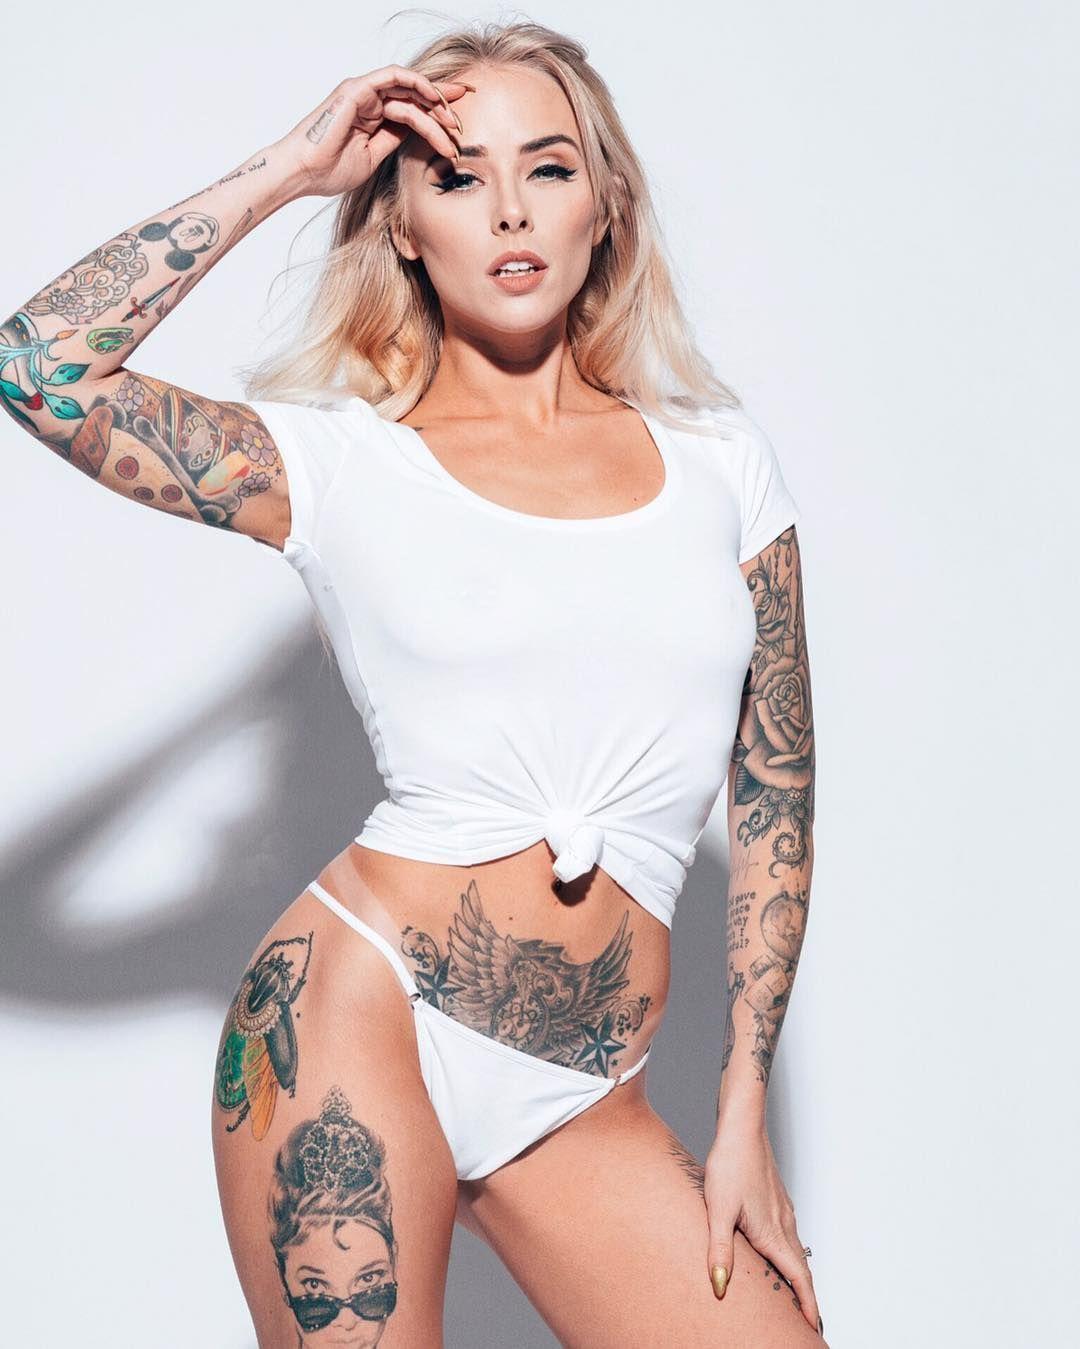 Alysha Nett Goddesses Milf Queens Ff Femdom Pornstar Women Xxx Pornstargoddess